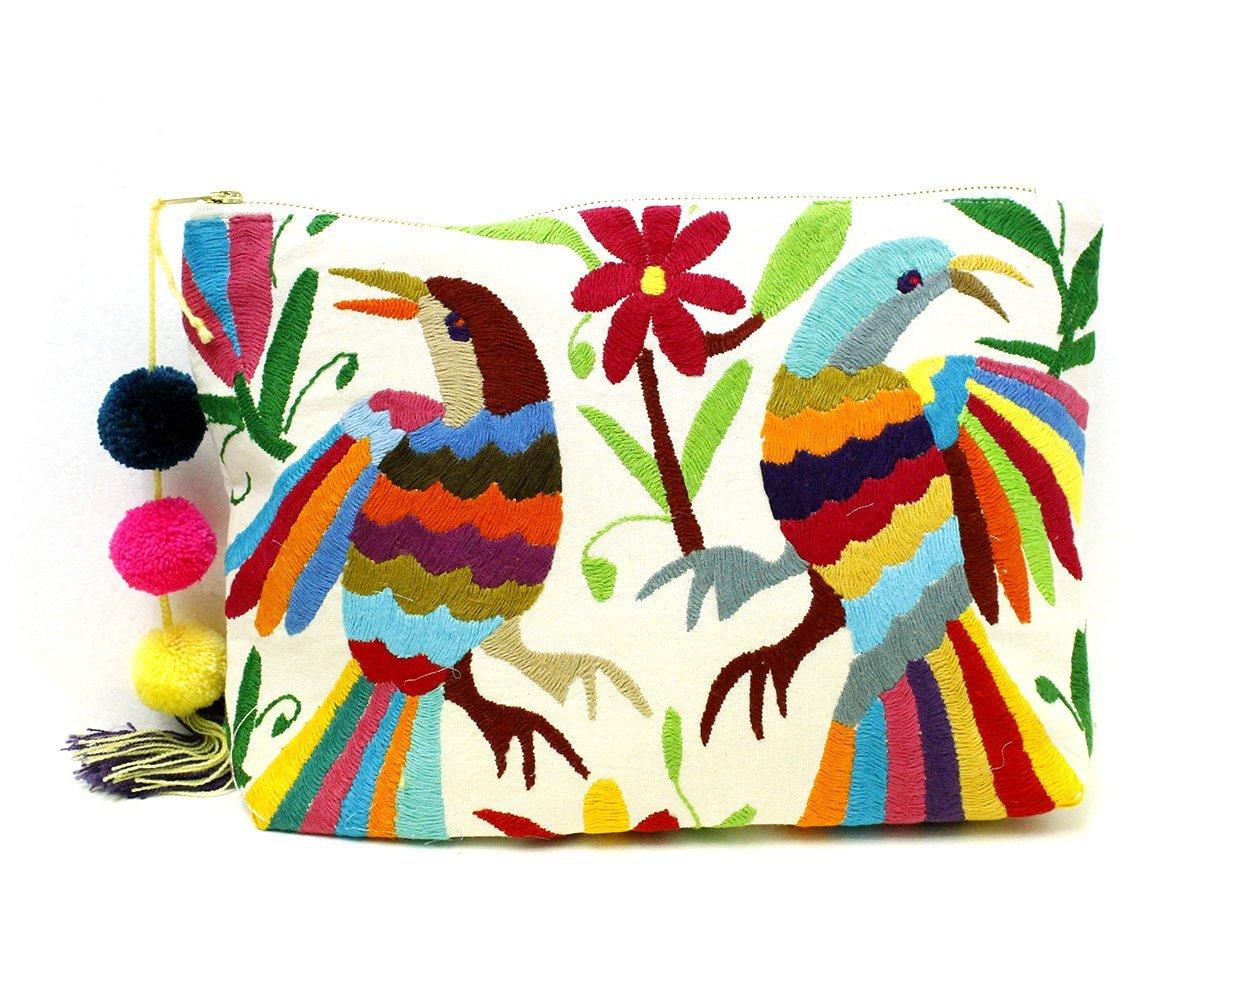 Otomi Embroidery Oversized Clutch Handbag Big Clutch by Erica Maree